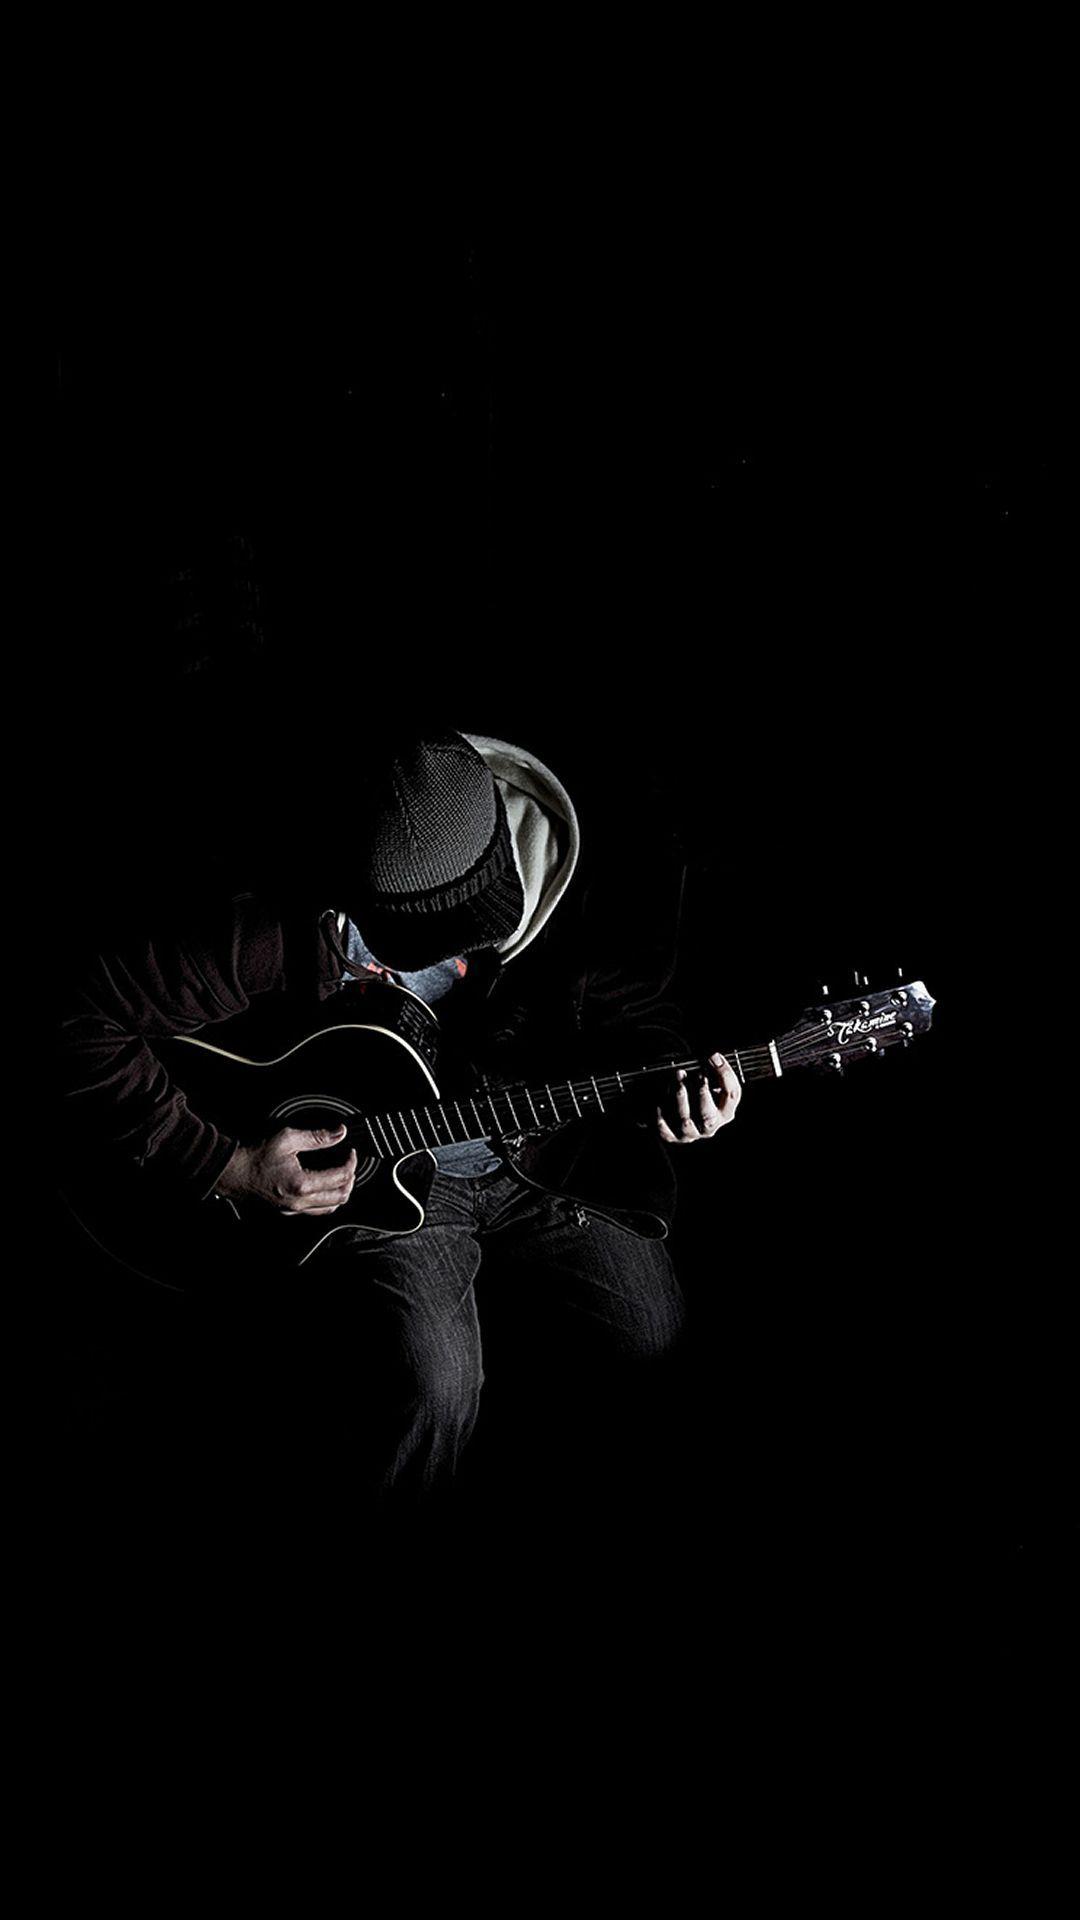 Dark Aesthetic Iphone Wallpapers Top Free Dark Aesthetic Iphone Backgrounds Wallpaperaccess Iphone Music Black Wallpaper Iphone Guitar Wallpaper Iphone